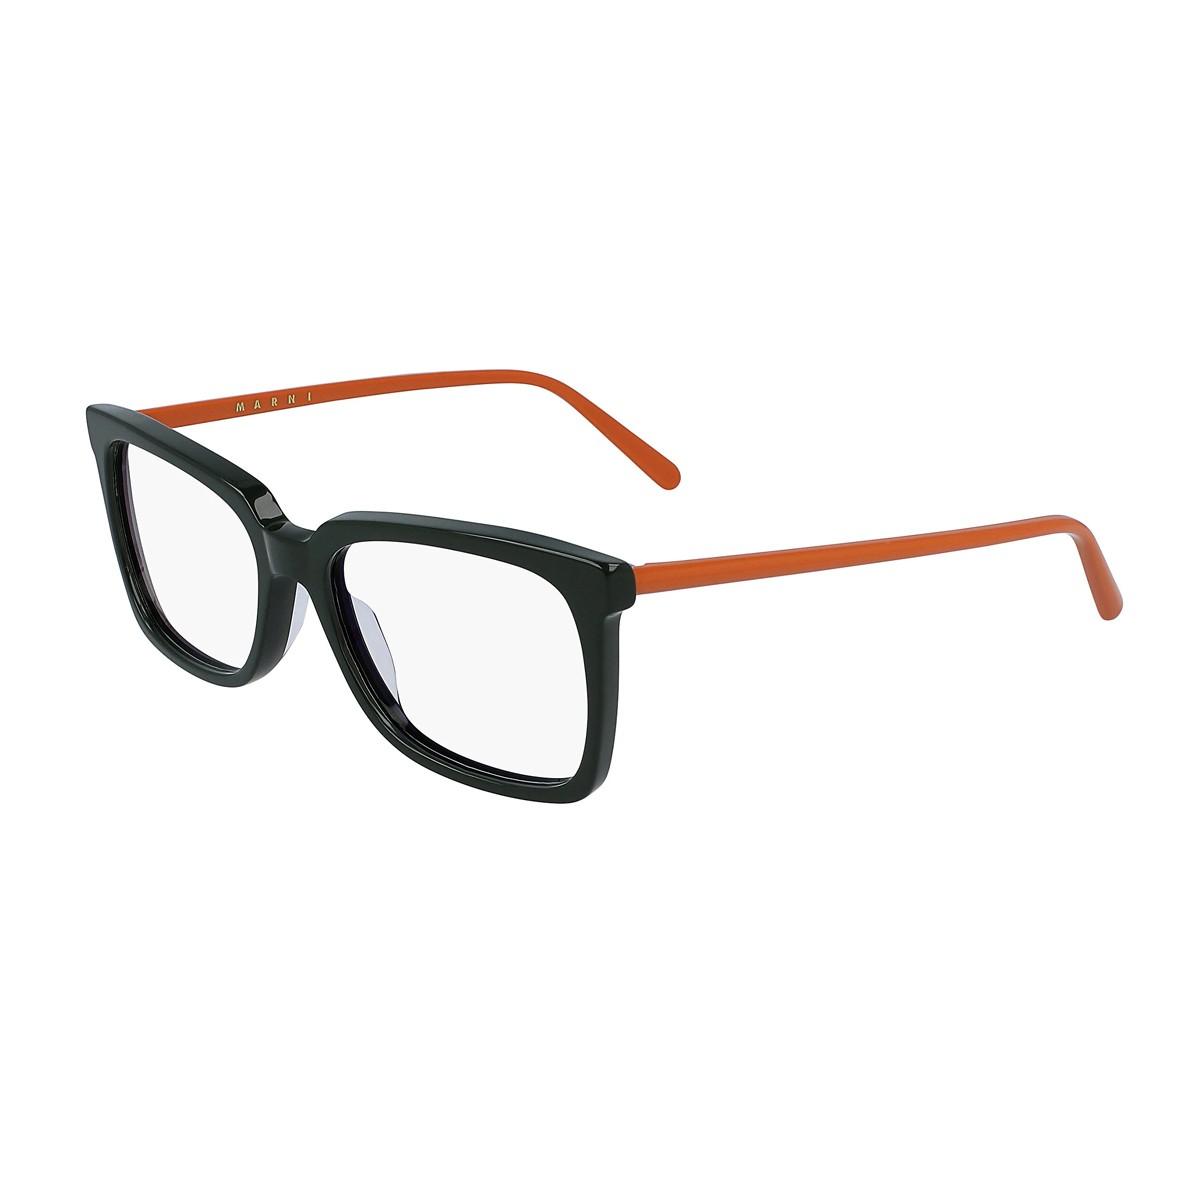 Marni ME2630 | Women's eyeglasses